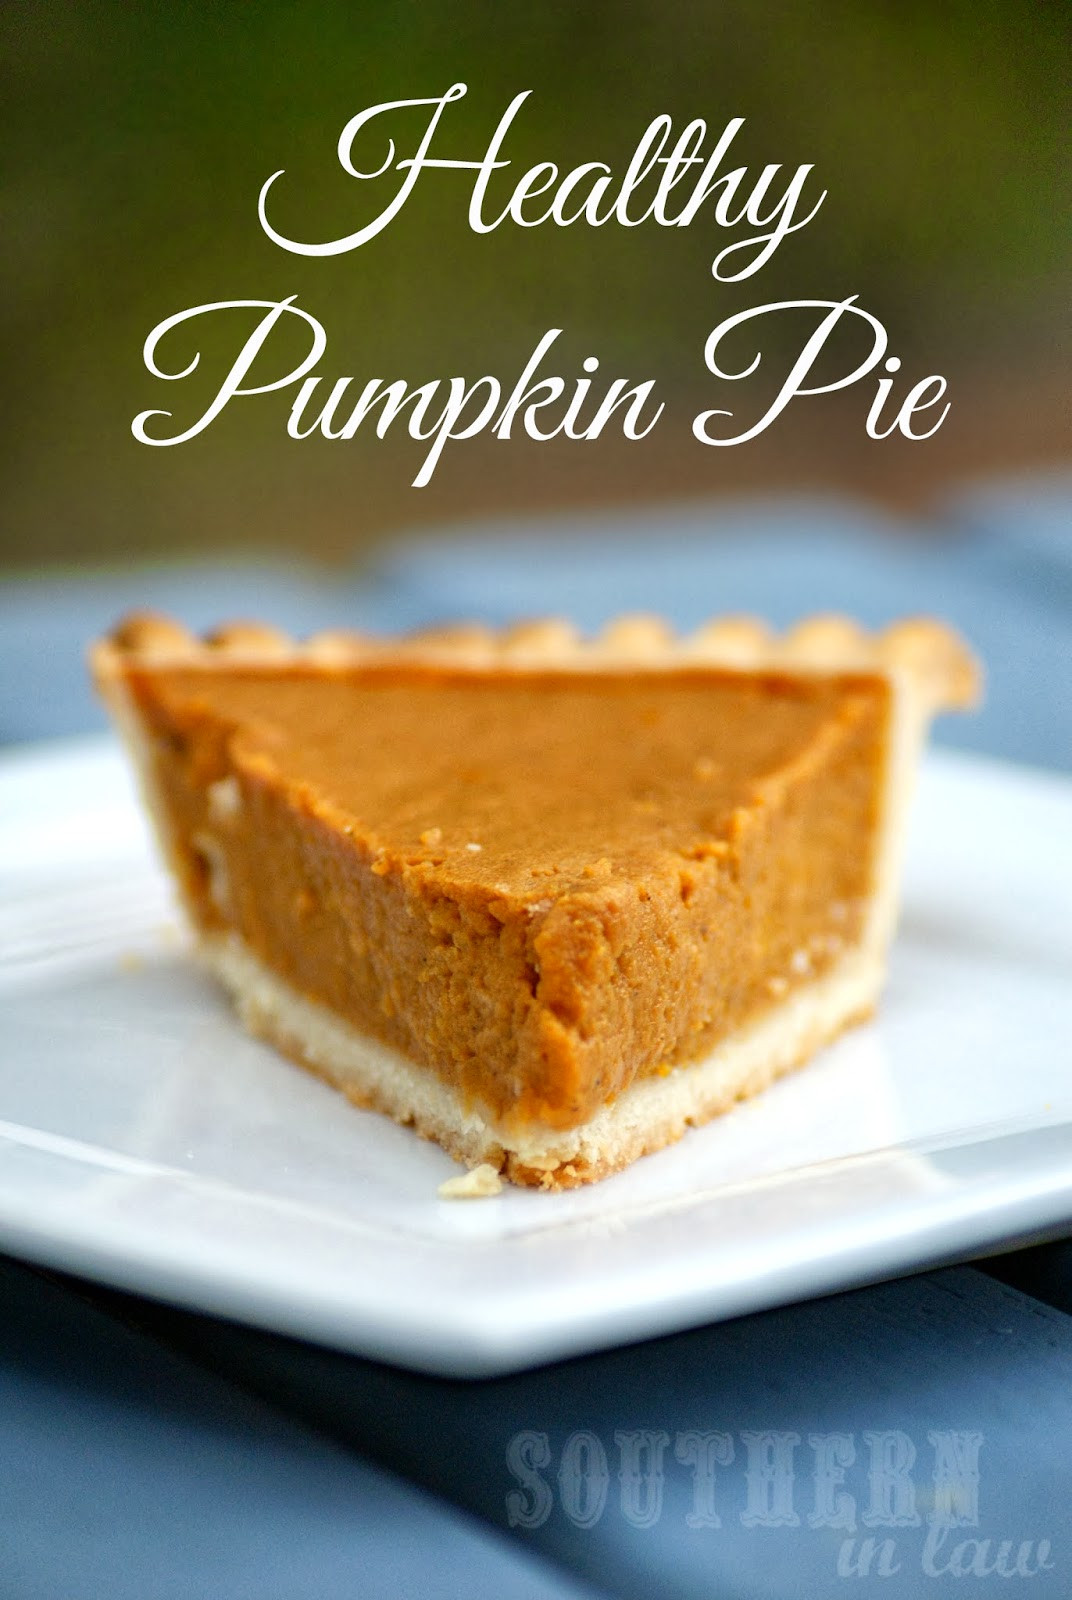 Pumpkin Pie Recipes Healthy  Southern In Law Healthy Pumpkin Pie Recipe